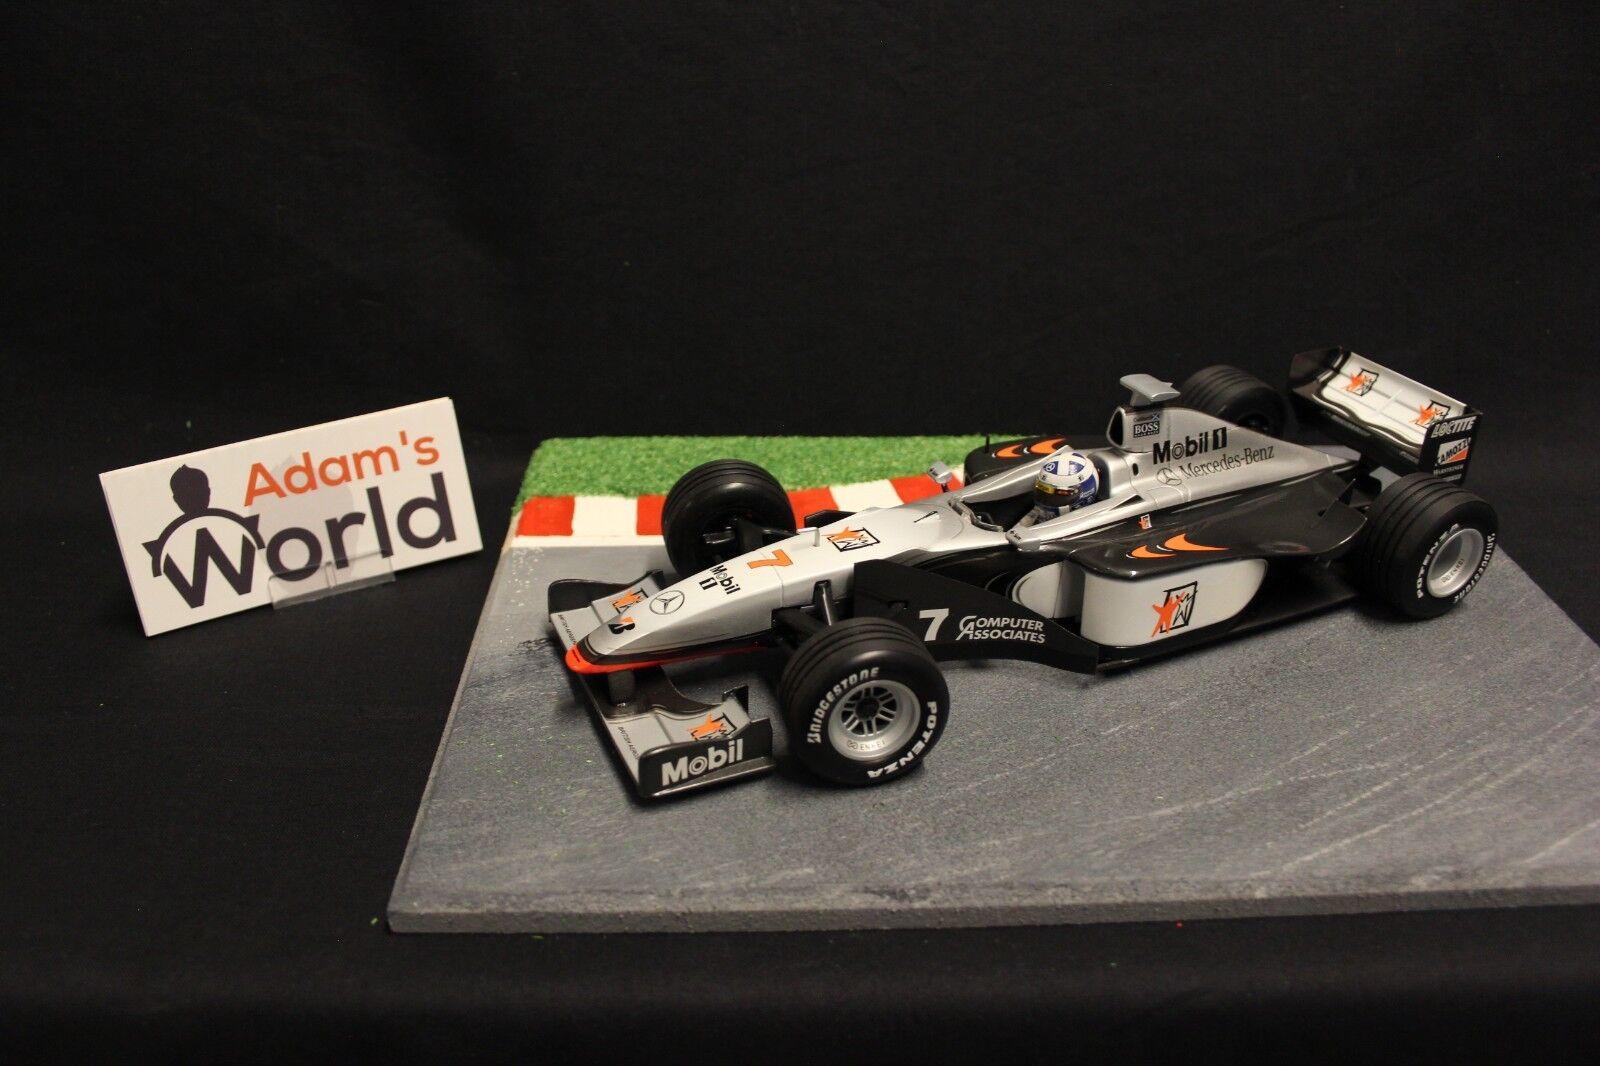 Minichamps McLaren Mercedes MP4-13 1998 1 18 David Coulthard (GBR) (F1NB)